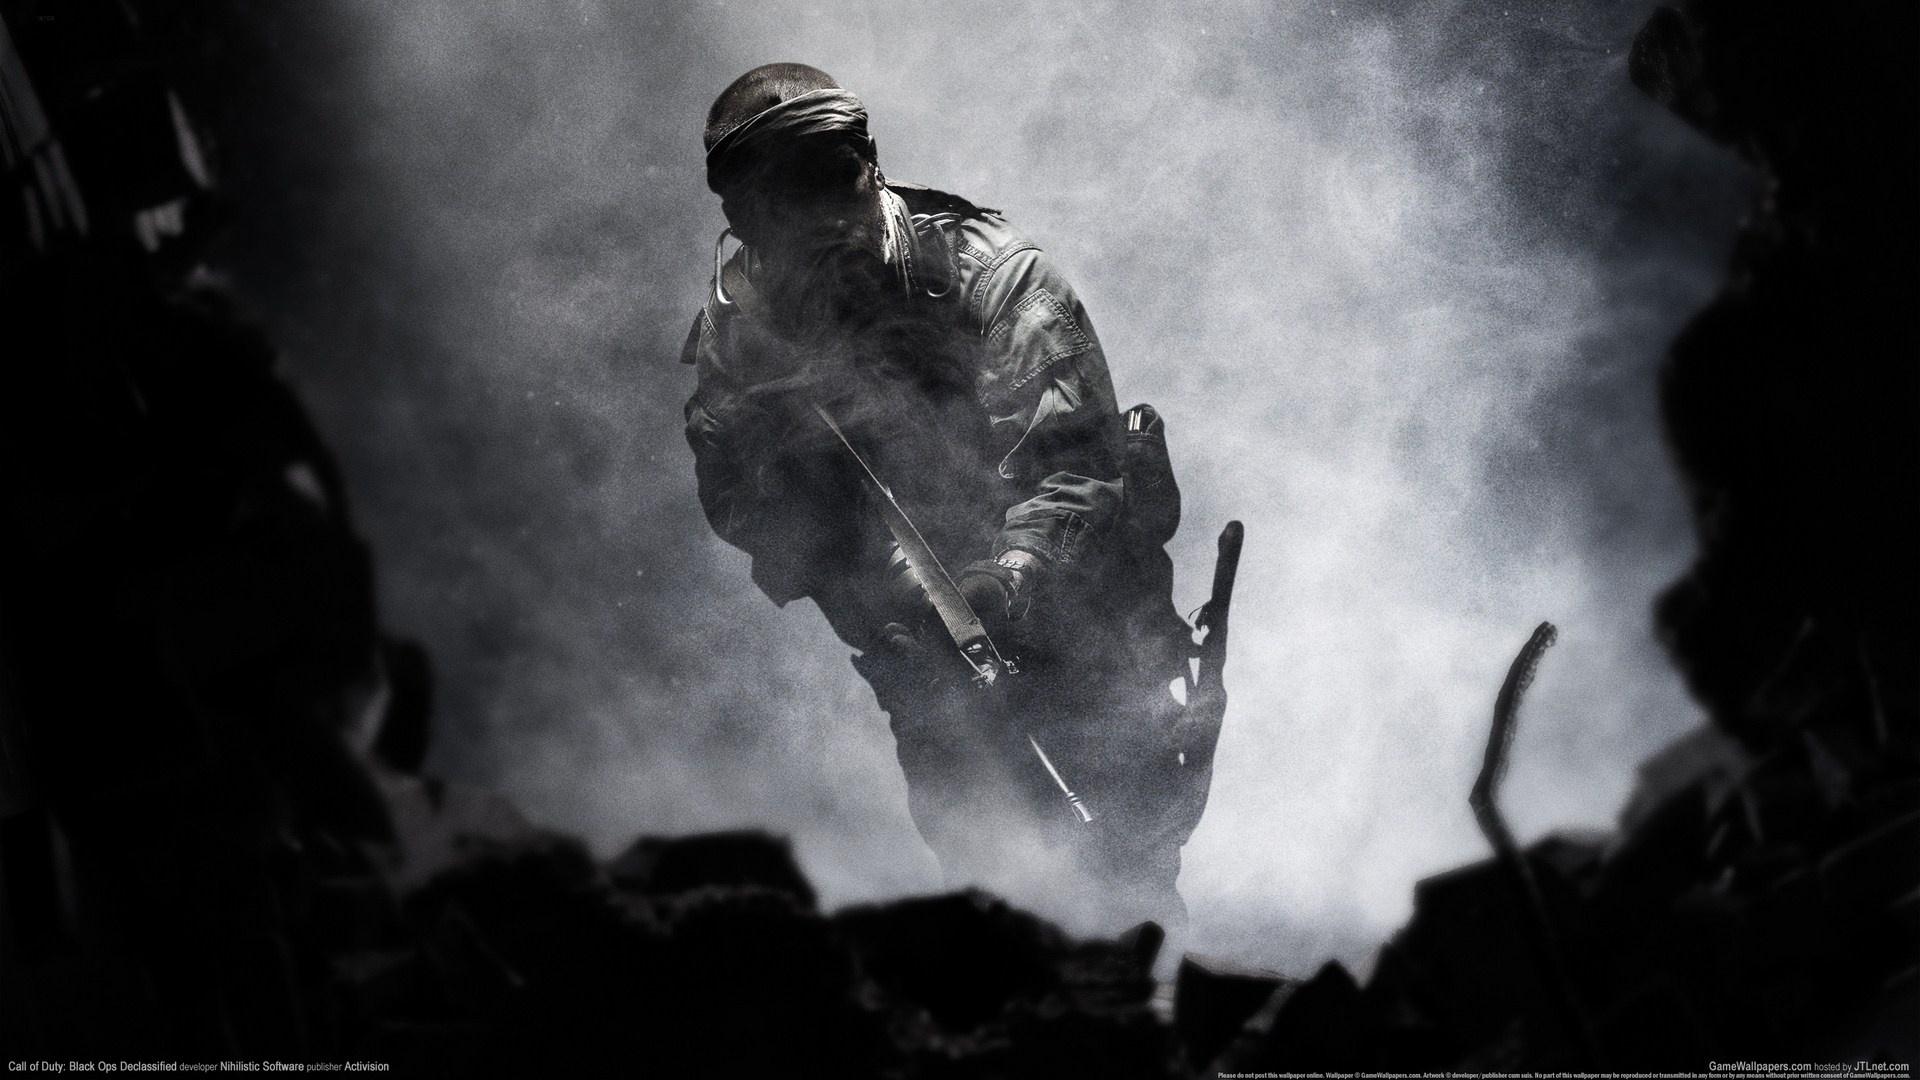 Wallpaper Call of Duty Black Ops Declassified 1920x1080 Full HD 1920x1080